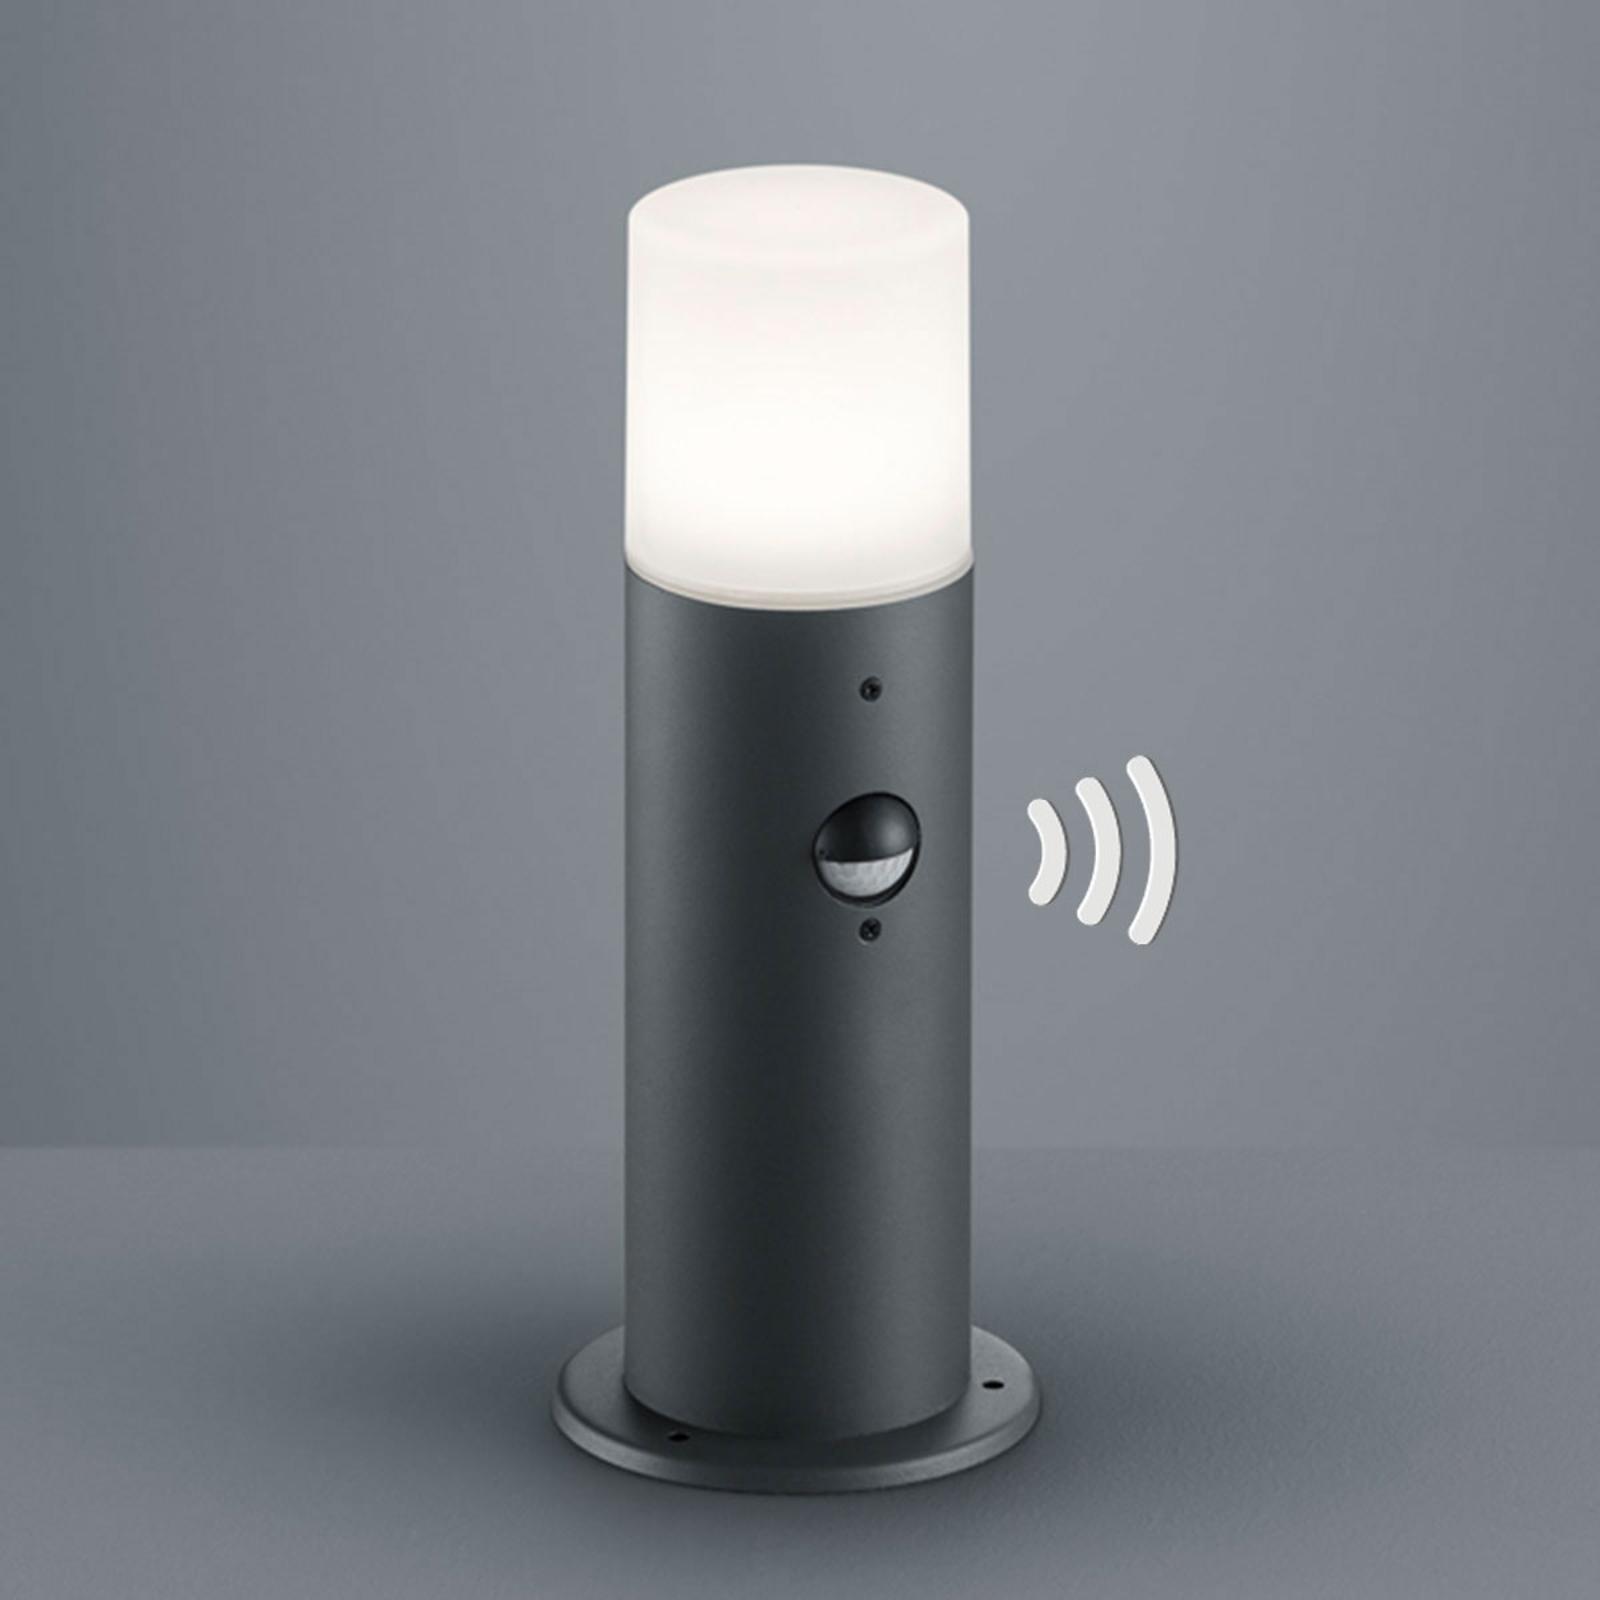 Sockelleuchte Hoosic in Anthrazit mit Sensor